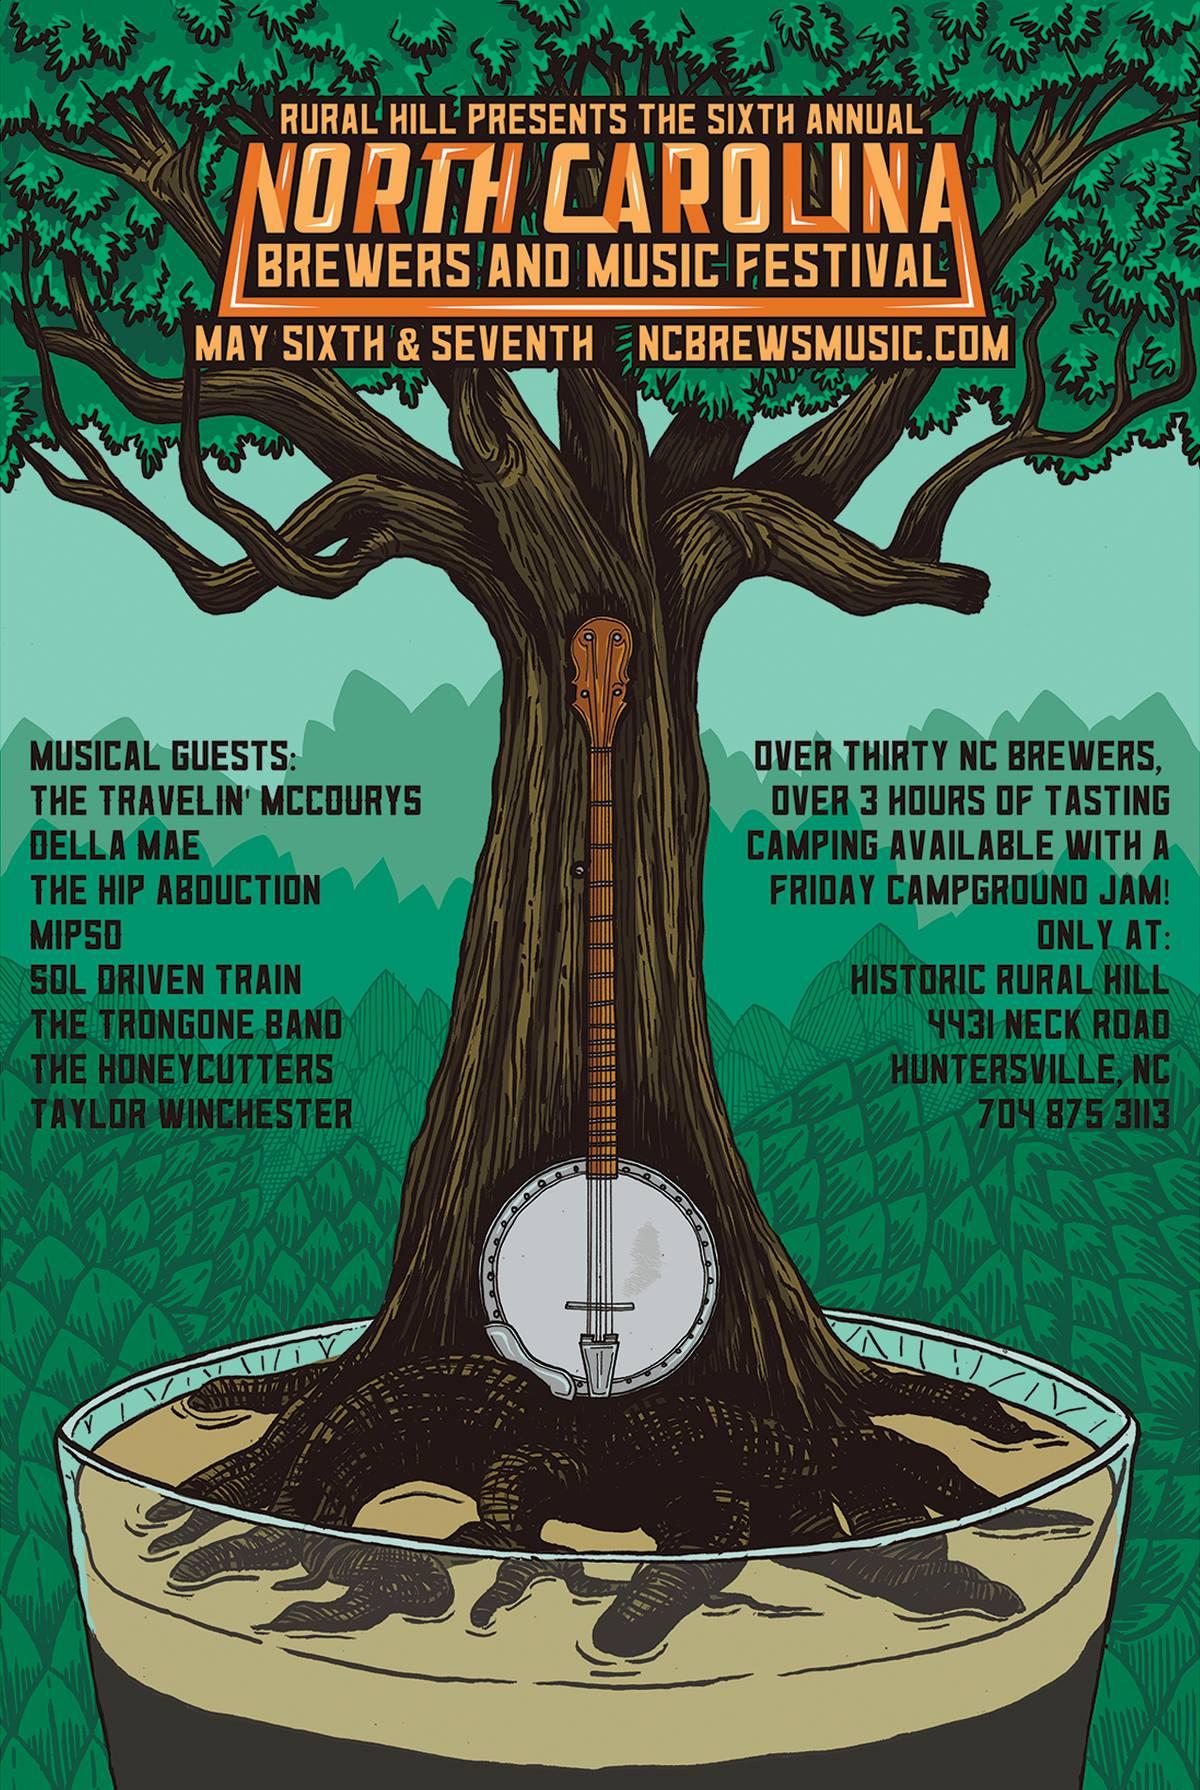 North Carolina Brewers & Music Festival